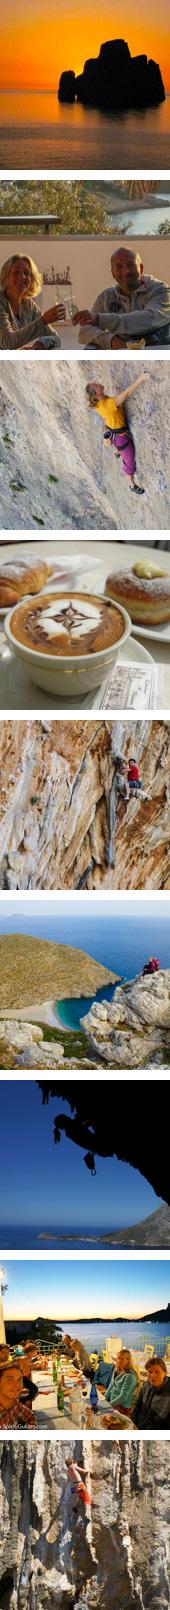 Sardinia Sicily rock climbing